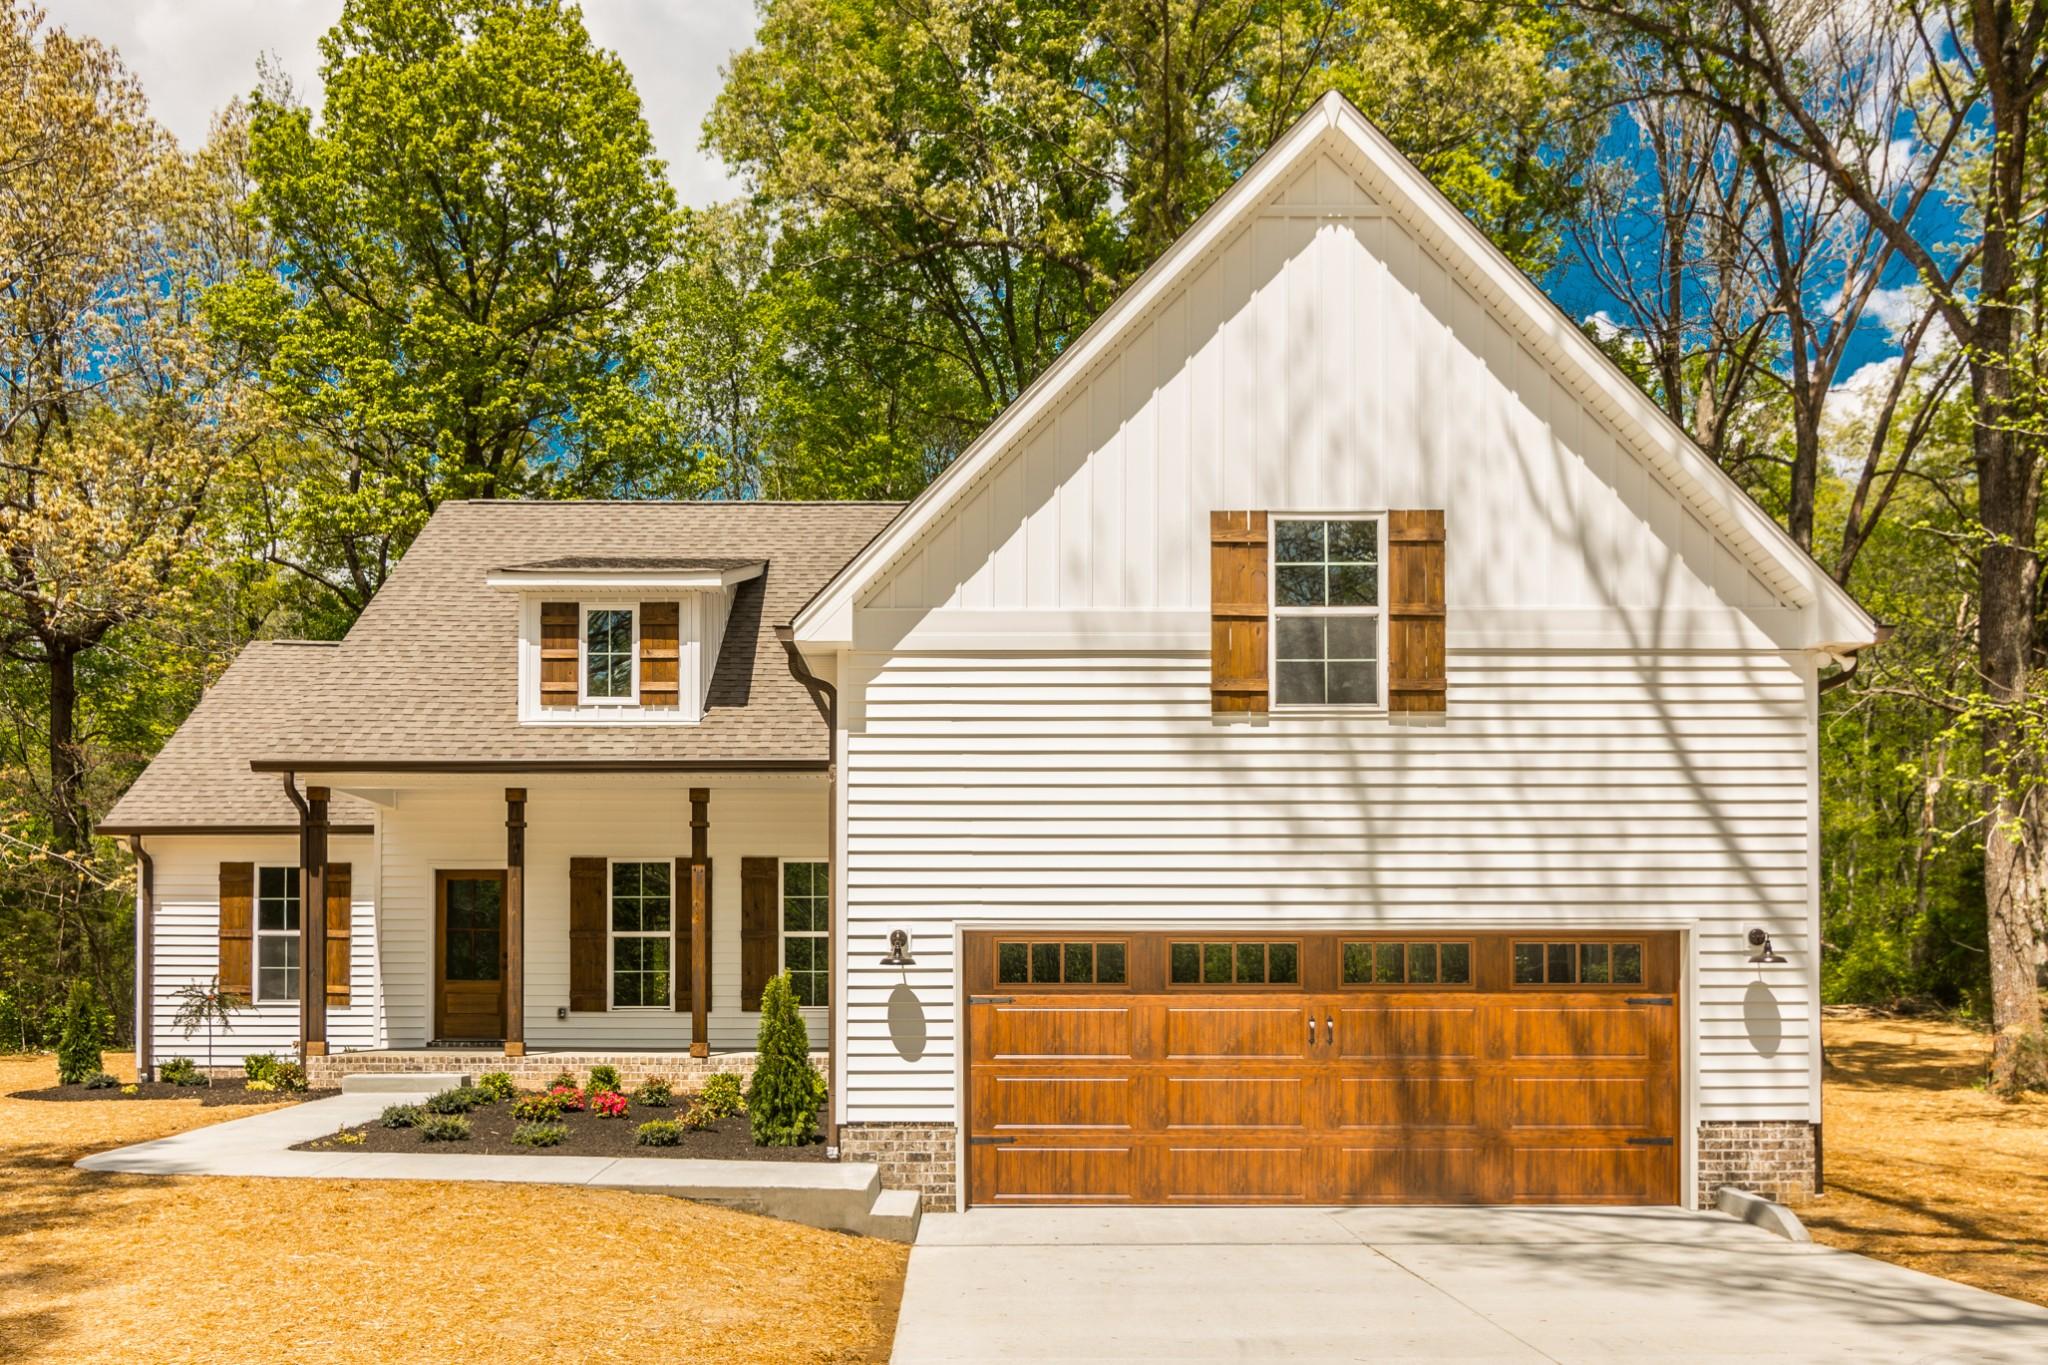 7834 Highway 52 Property Photo - Orlinda, TN real estate listing